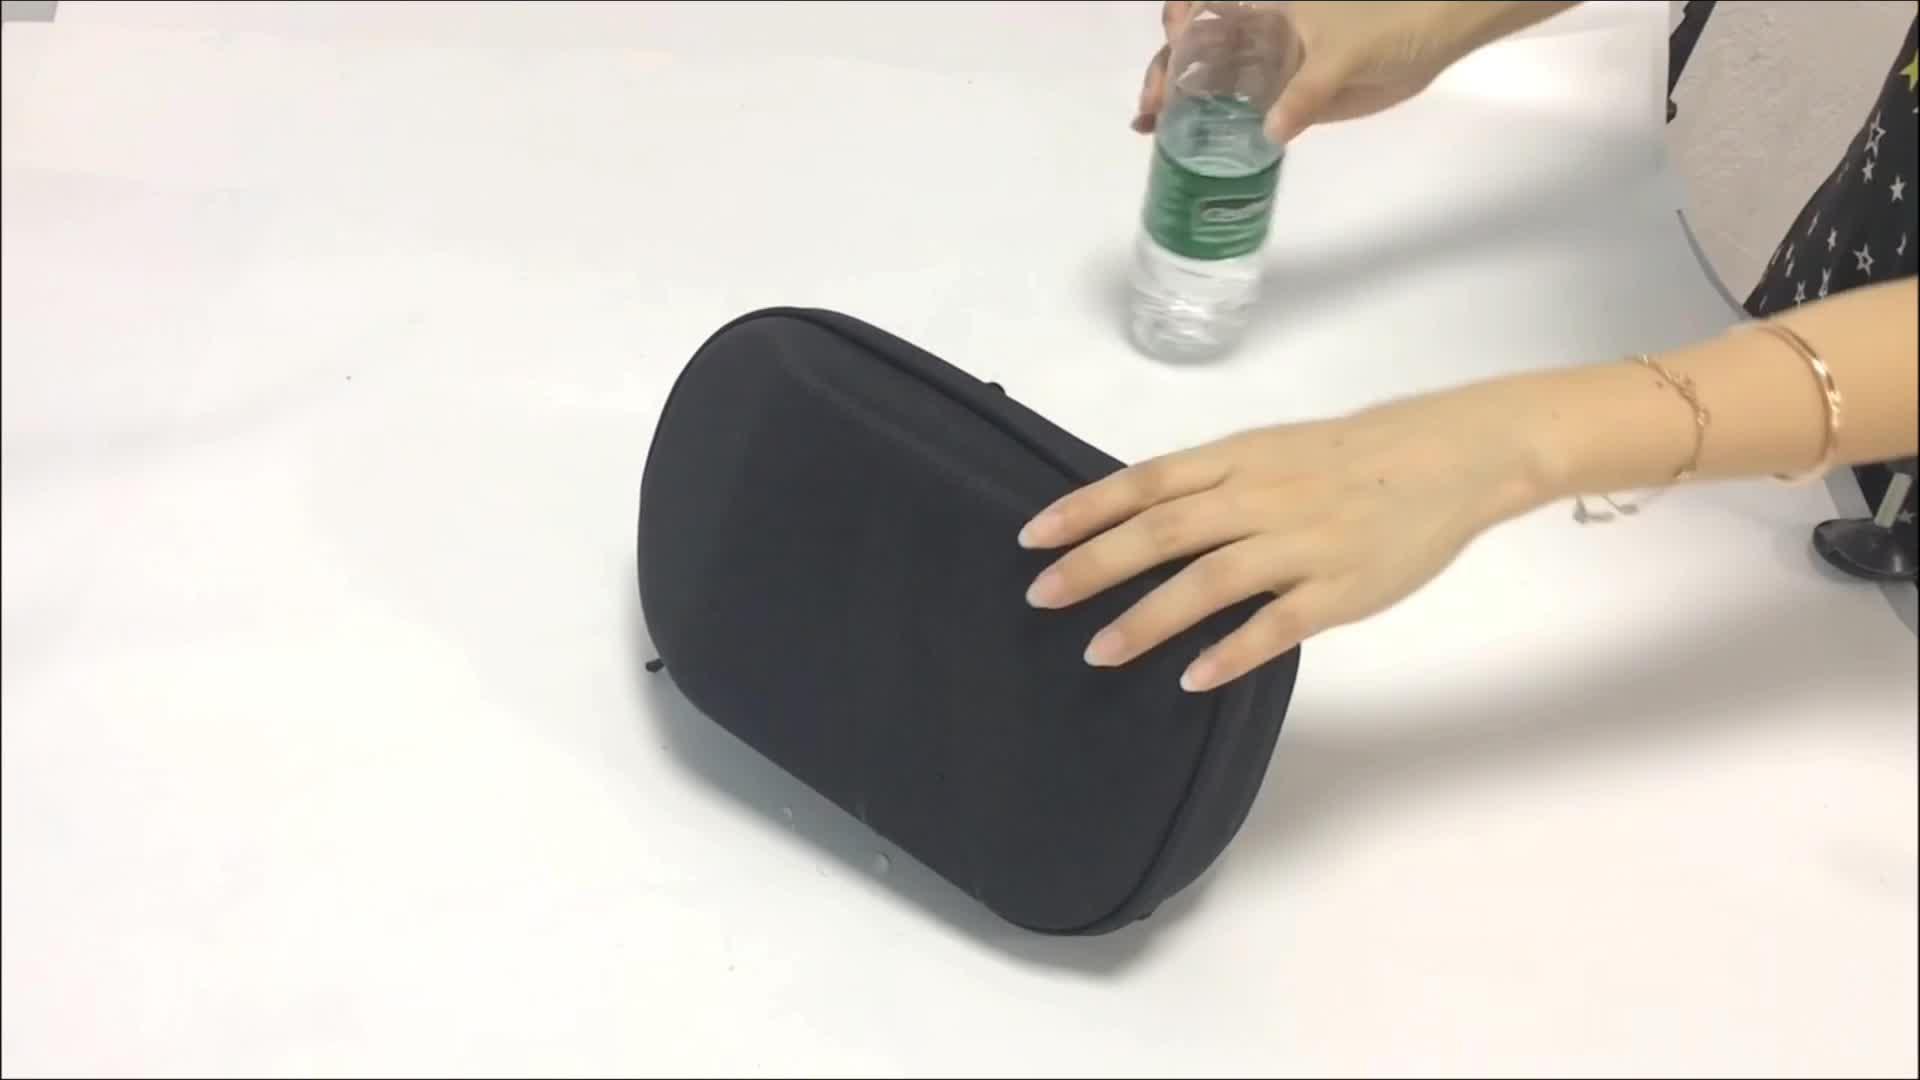 Tas Skuter Elektrik, Aksesoris Scooter Elektrik Baru dengan Kepala Skuter Elektrik Multi Pembawa untuk Xiaomi E